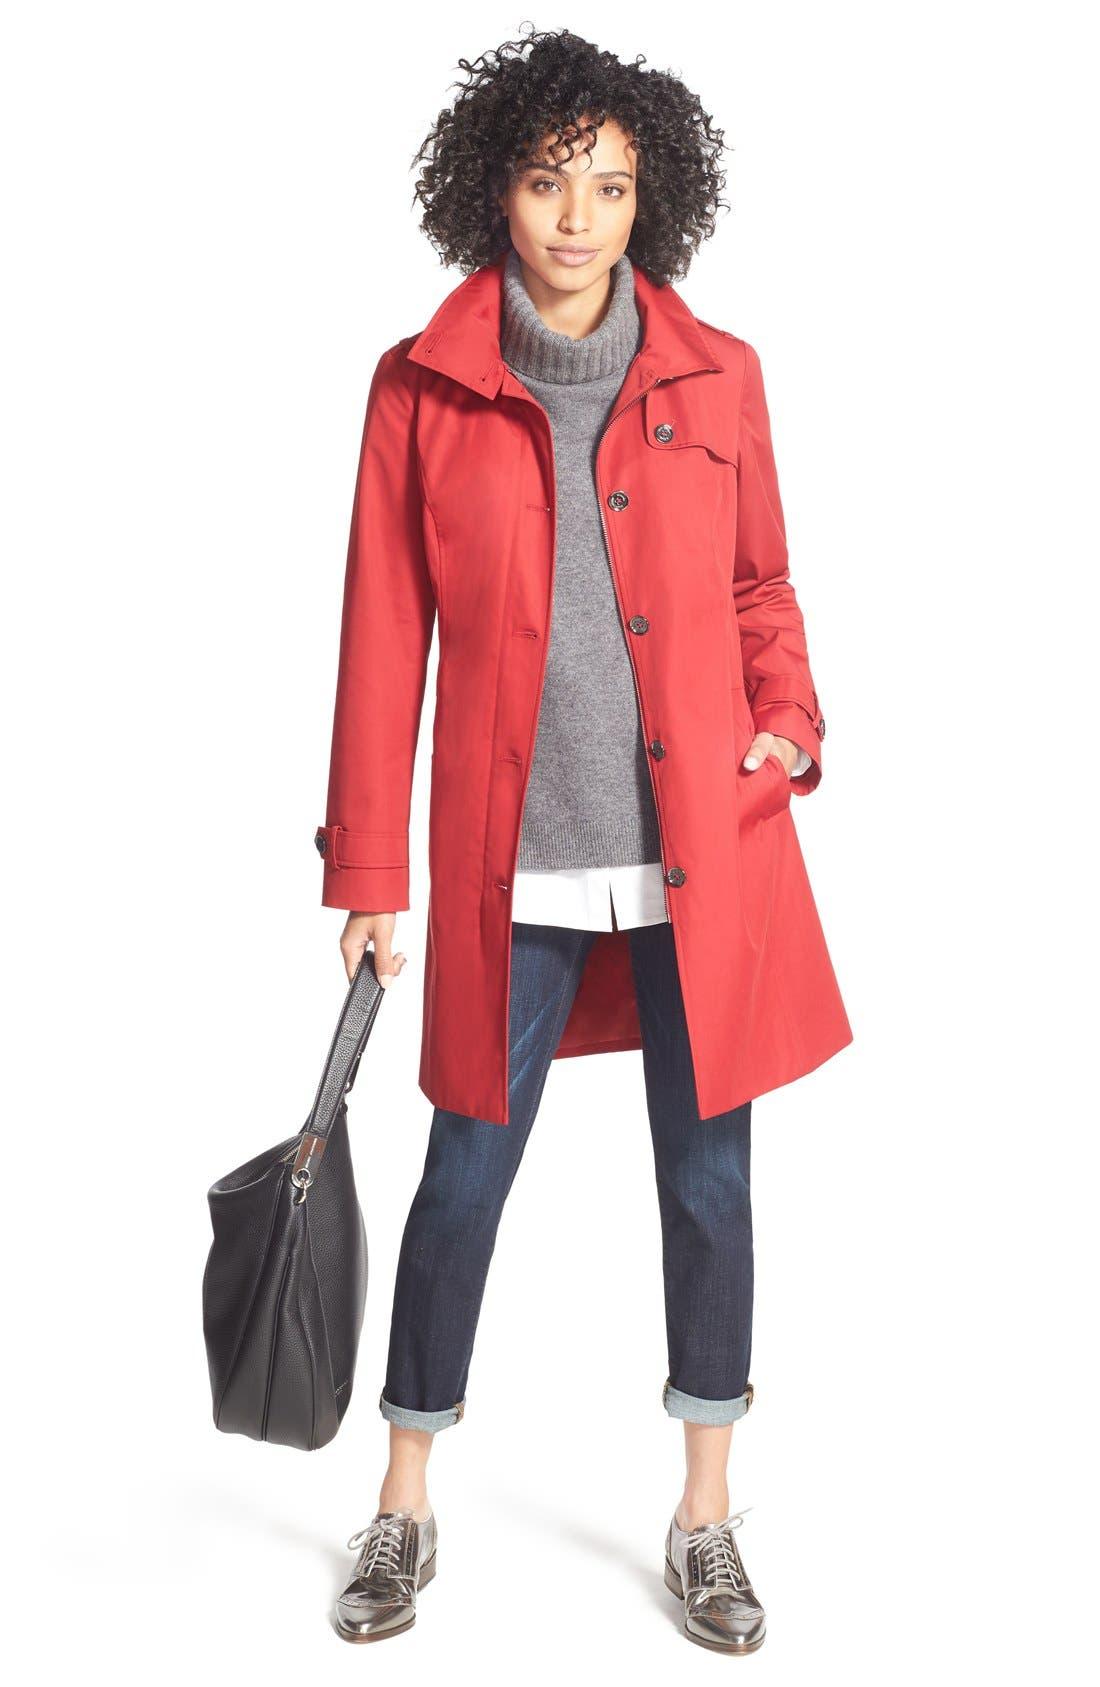 MICHAEL Michael Kors Trench Coat, Halogen® Sweater & Caslon® Jeans